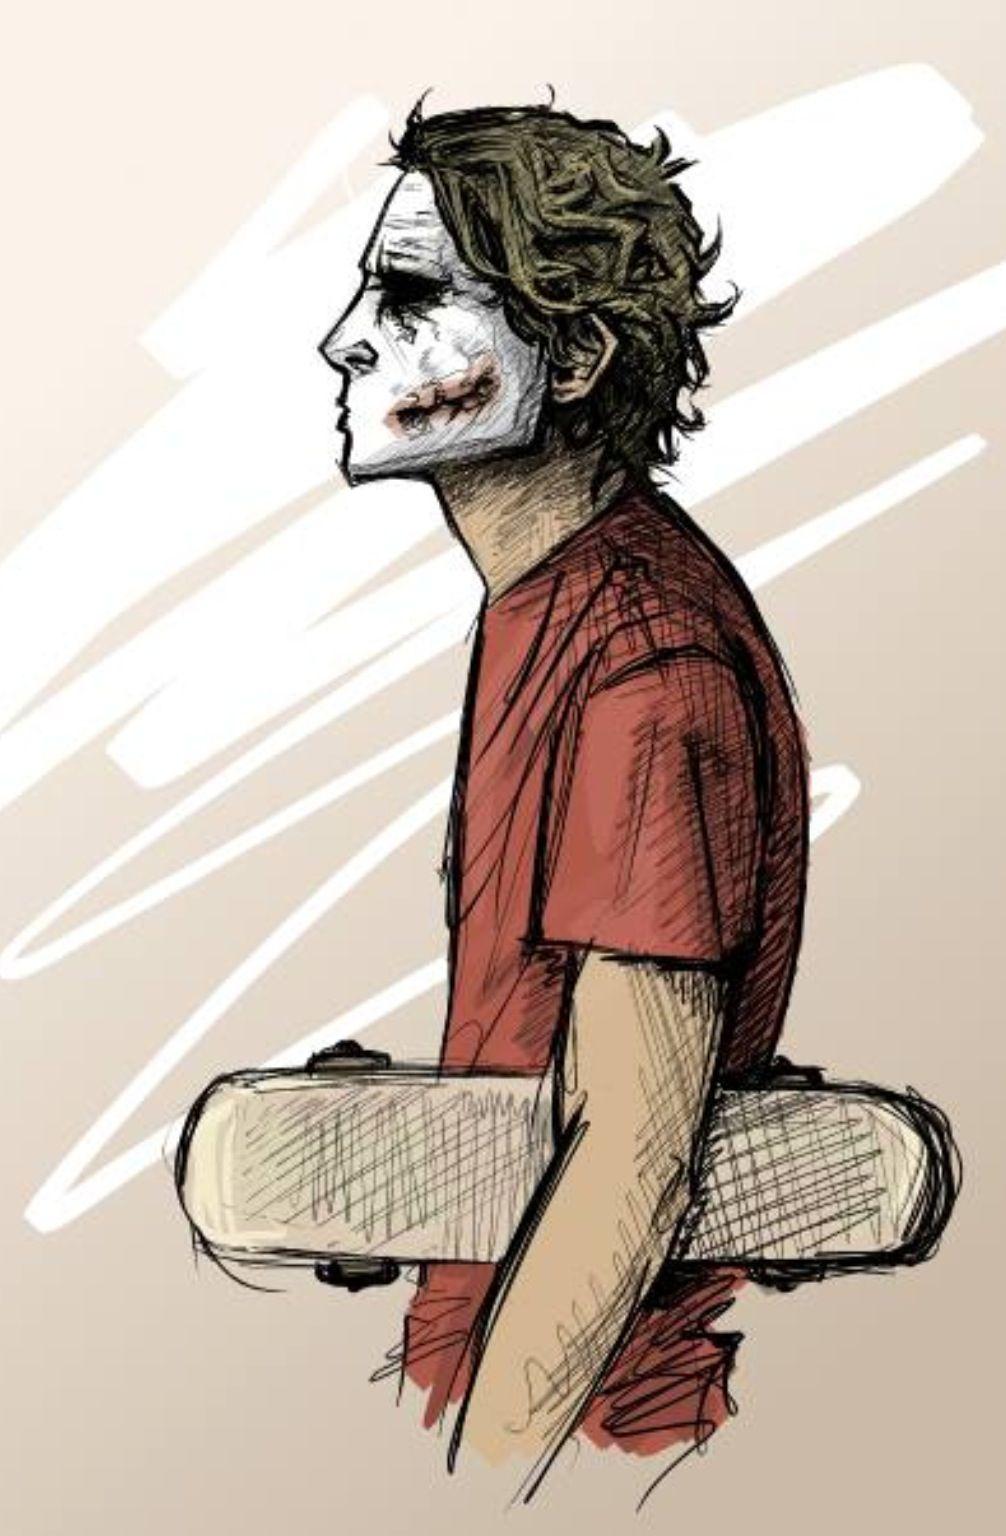 The Joker and his skateboard. Because he's the Joker